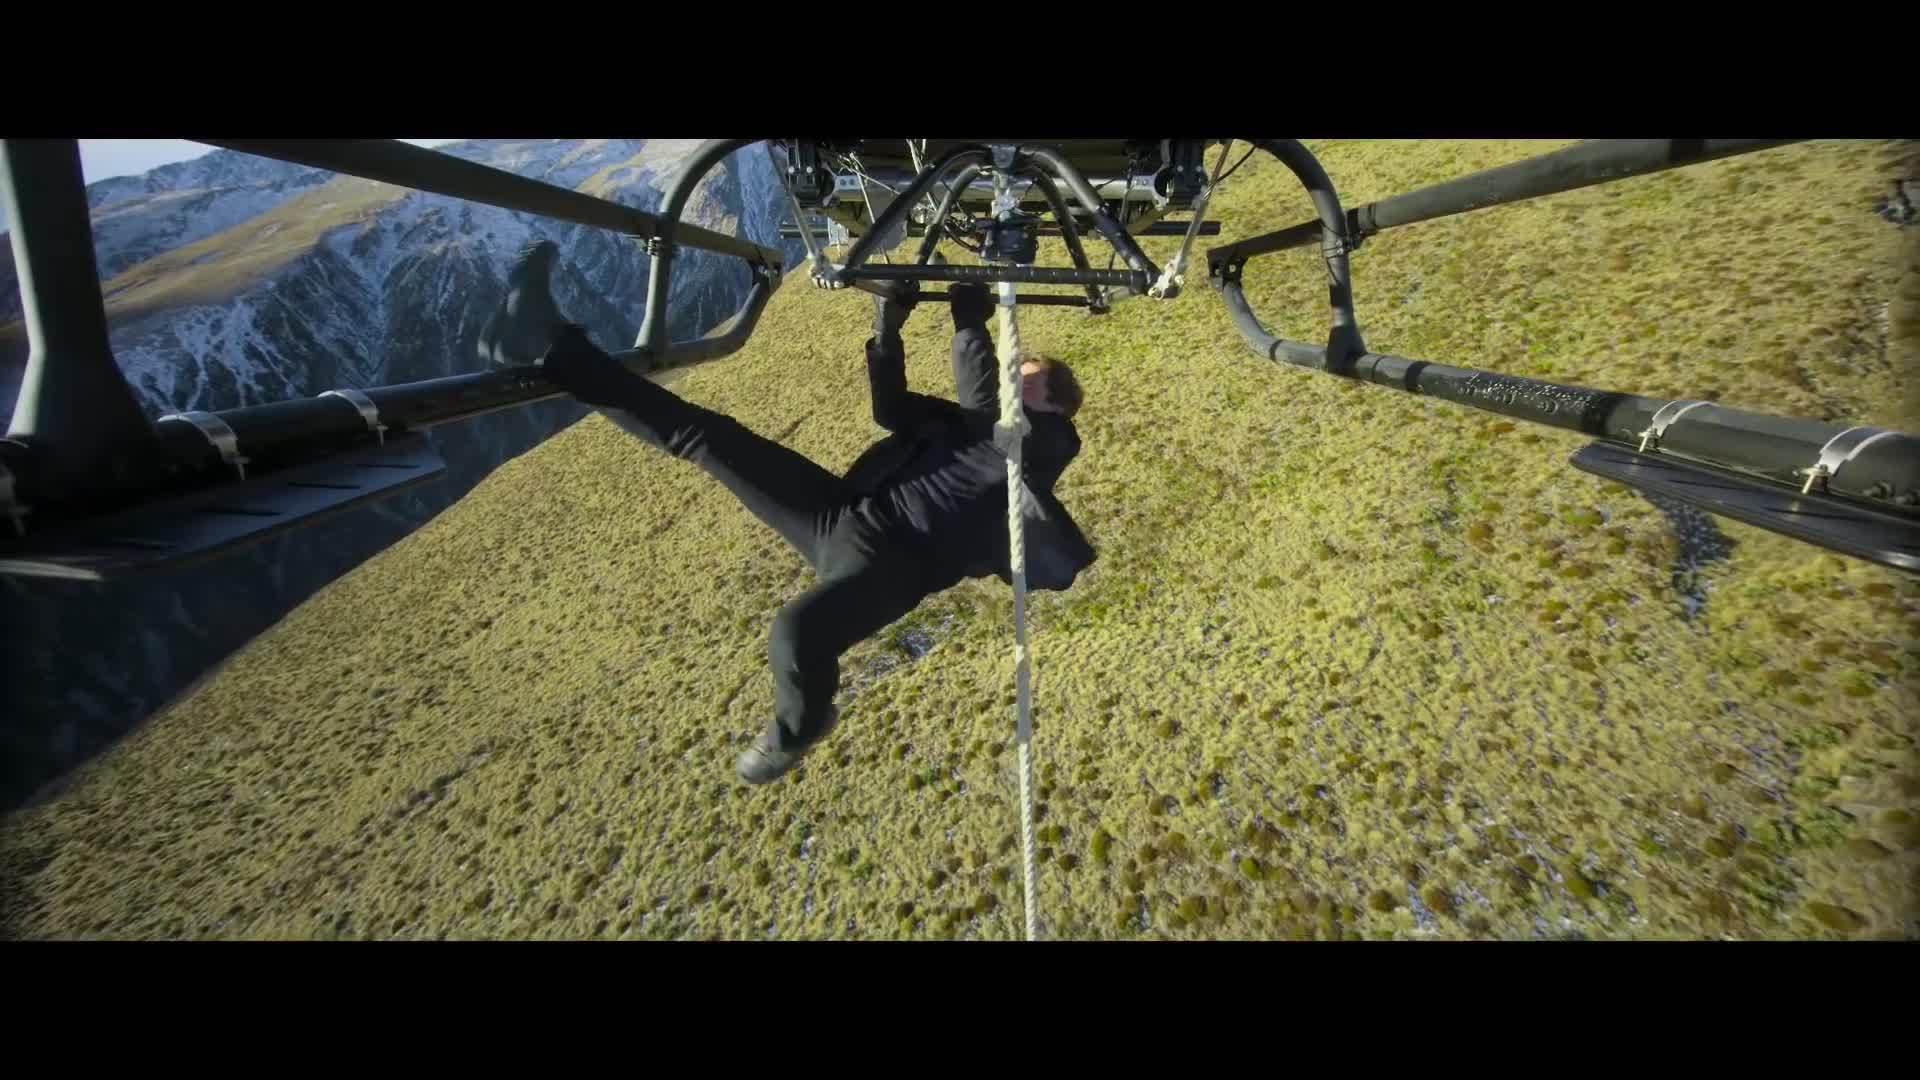 Tom Cruise diễn cảnh mạo hiểm trong Mission: Impossible 6